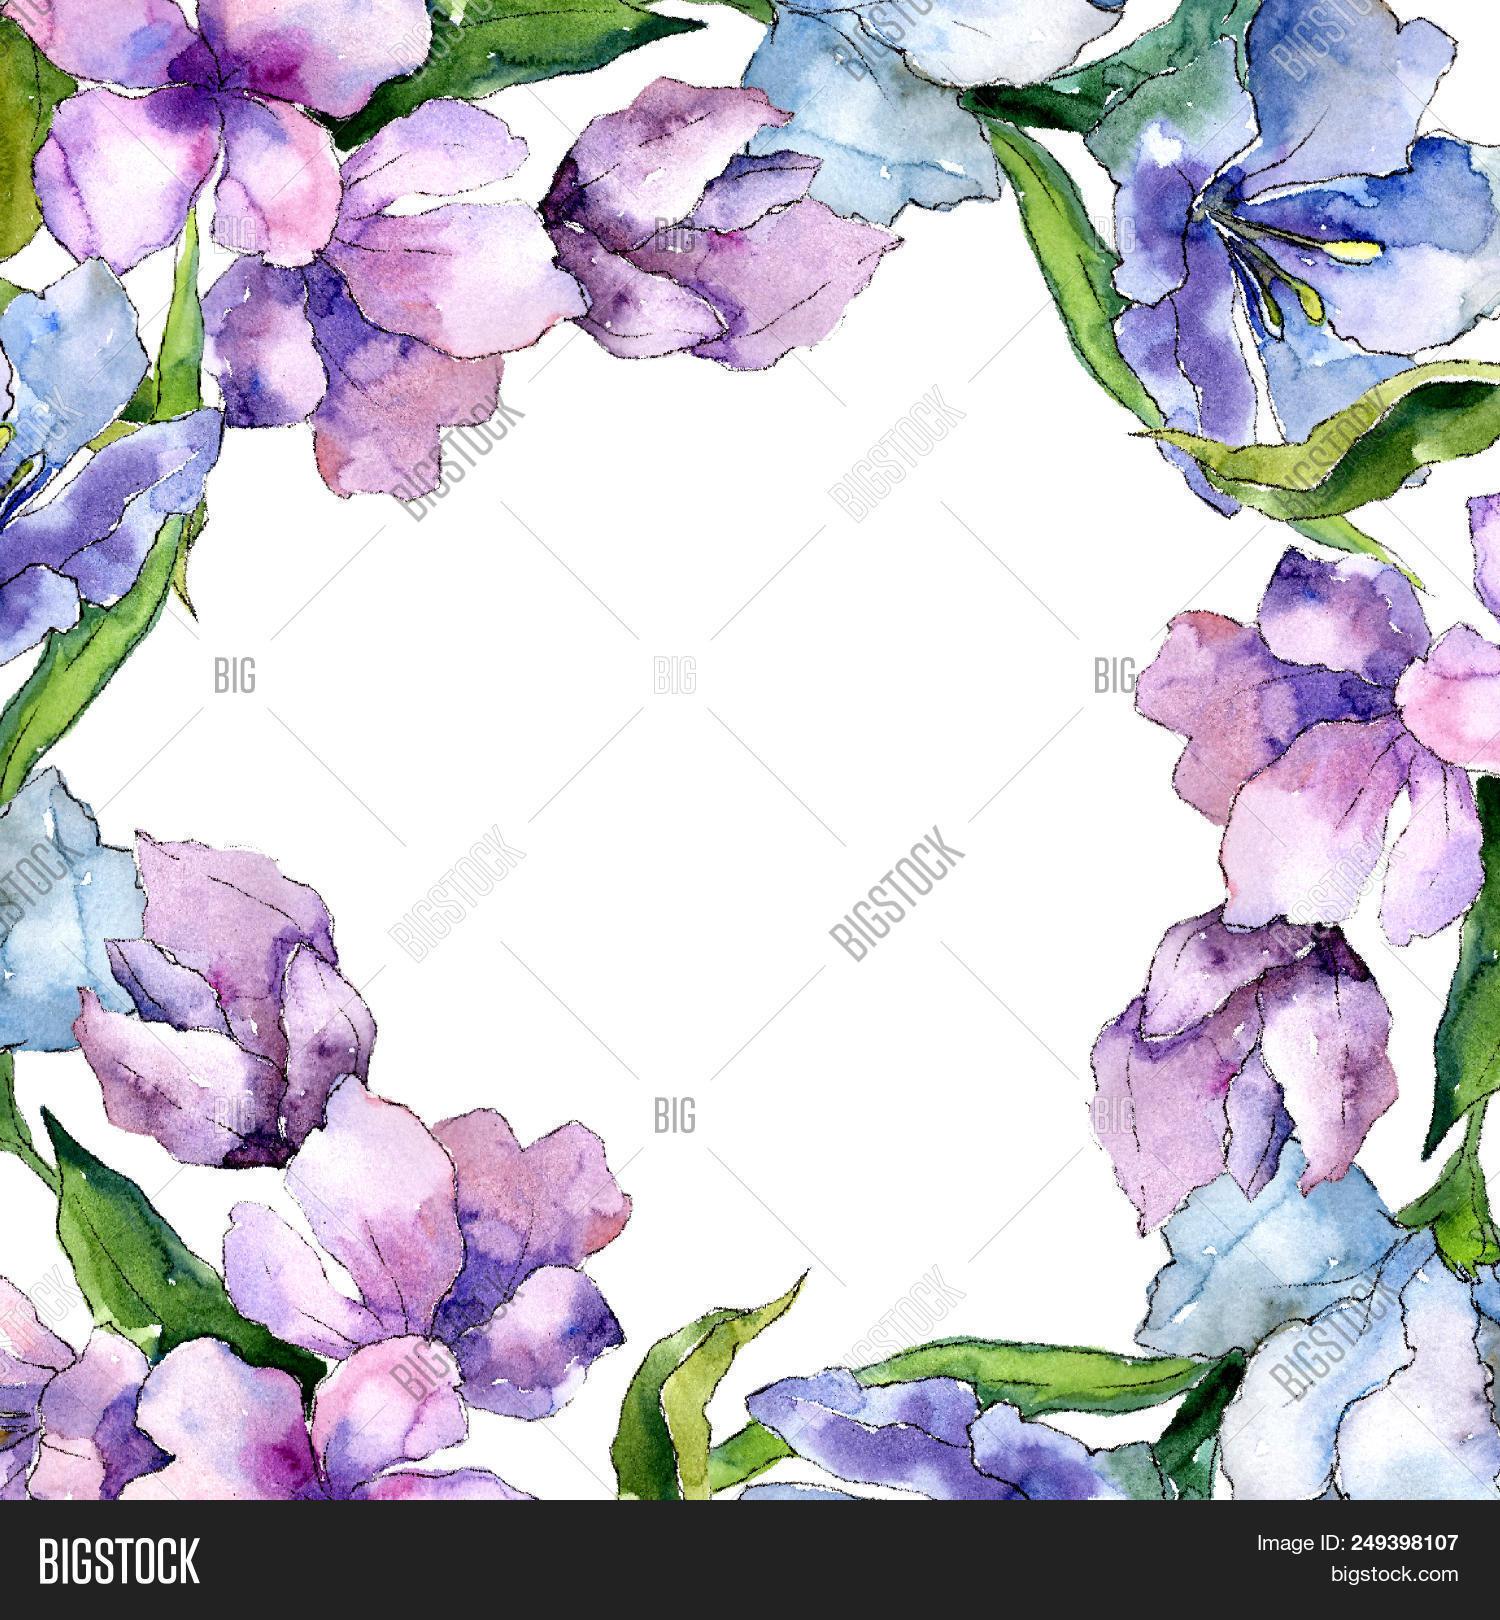 Purple blue image photo free trial bigstock purple and blue alstroemeria flowers floral botanical flower frame border ornament square aquarel izmirmasajfo